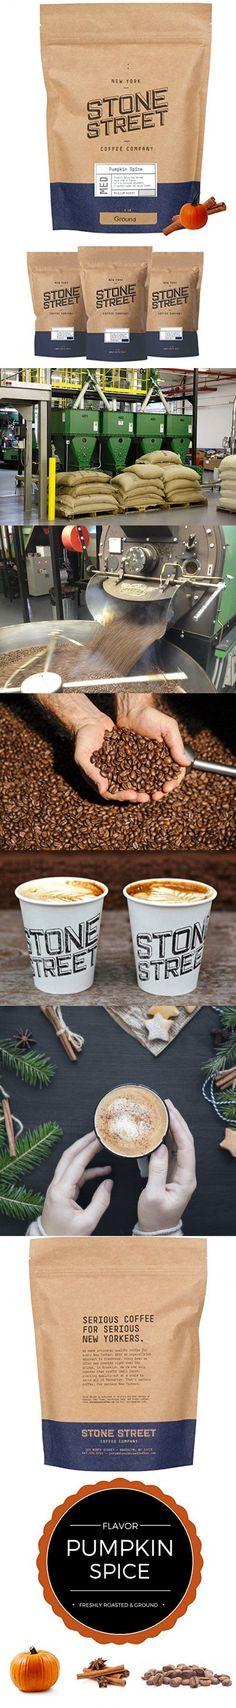 Stone Street Coffee Freshly Roasted Colombian Arabica Cinnamon/Nutmeg Creamy PUMPKIN SPICEGround Coffee, 1 lb Street Coffee, Stone Street, Ground Coffee, Pumpkin Spice, Cinnamon, Roast, Spices, Candy, Food